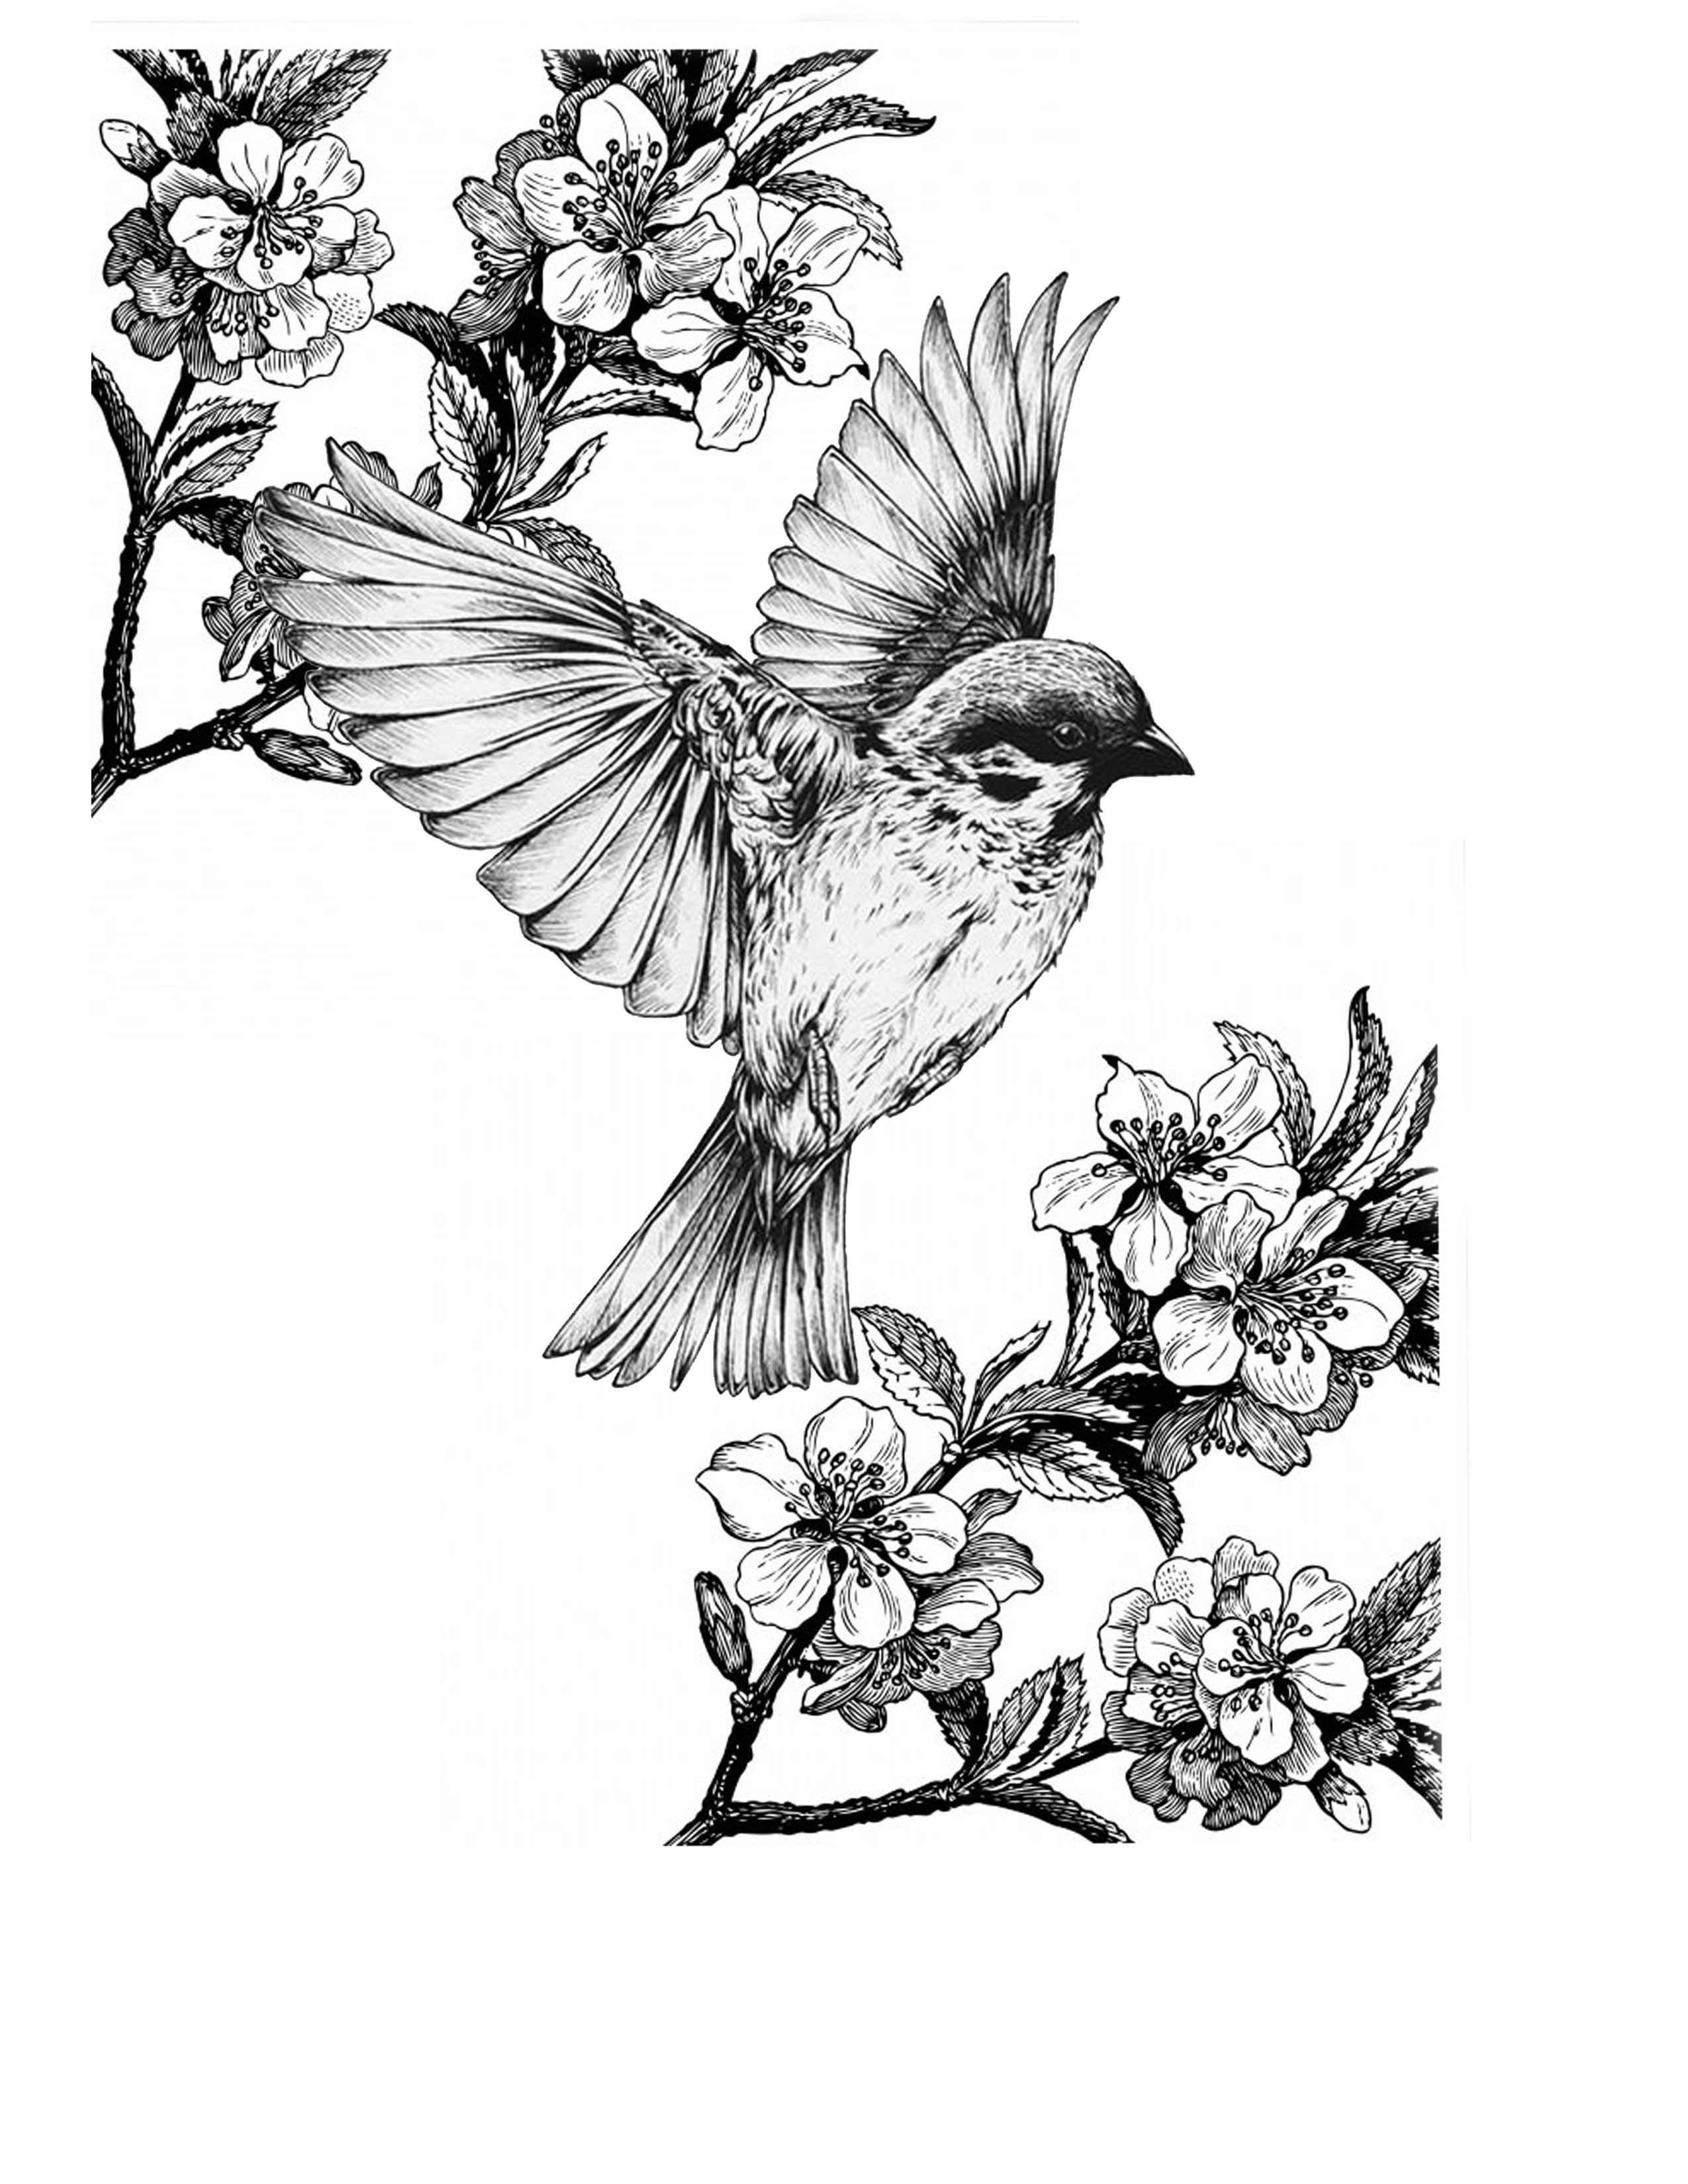 pingl par j nis resnis sur blackwork ink en 2018 pinterest dessin tatouage et tatouage oiseau. Black Bedroom Furniture Sets. Home Design Ideas